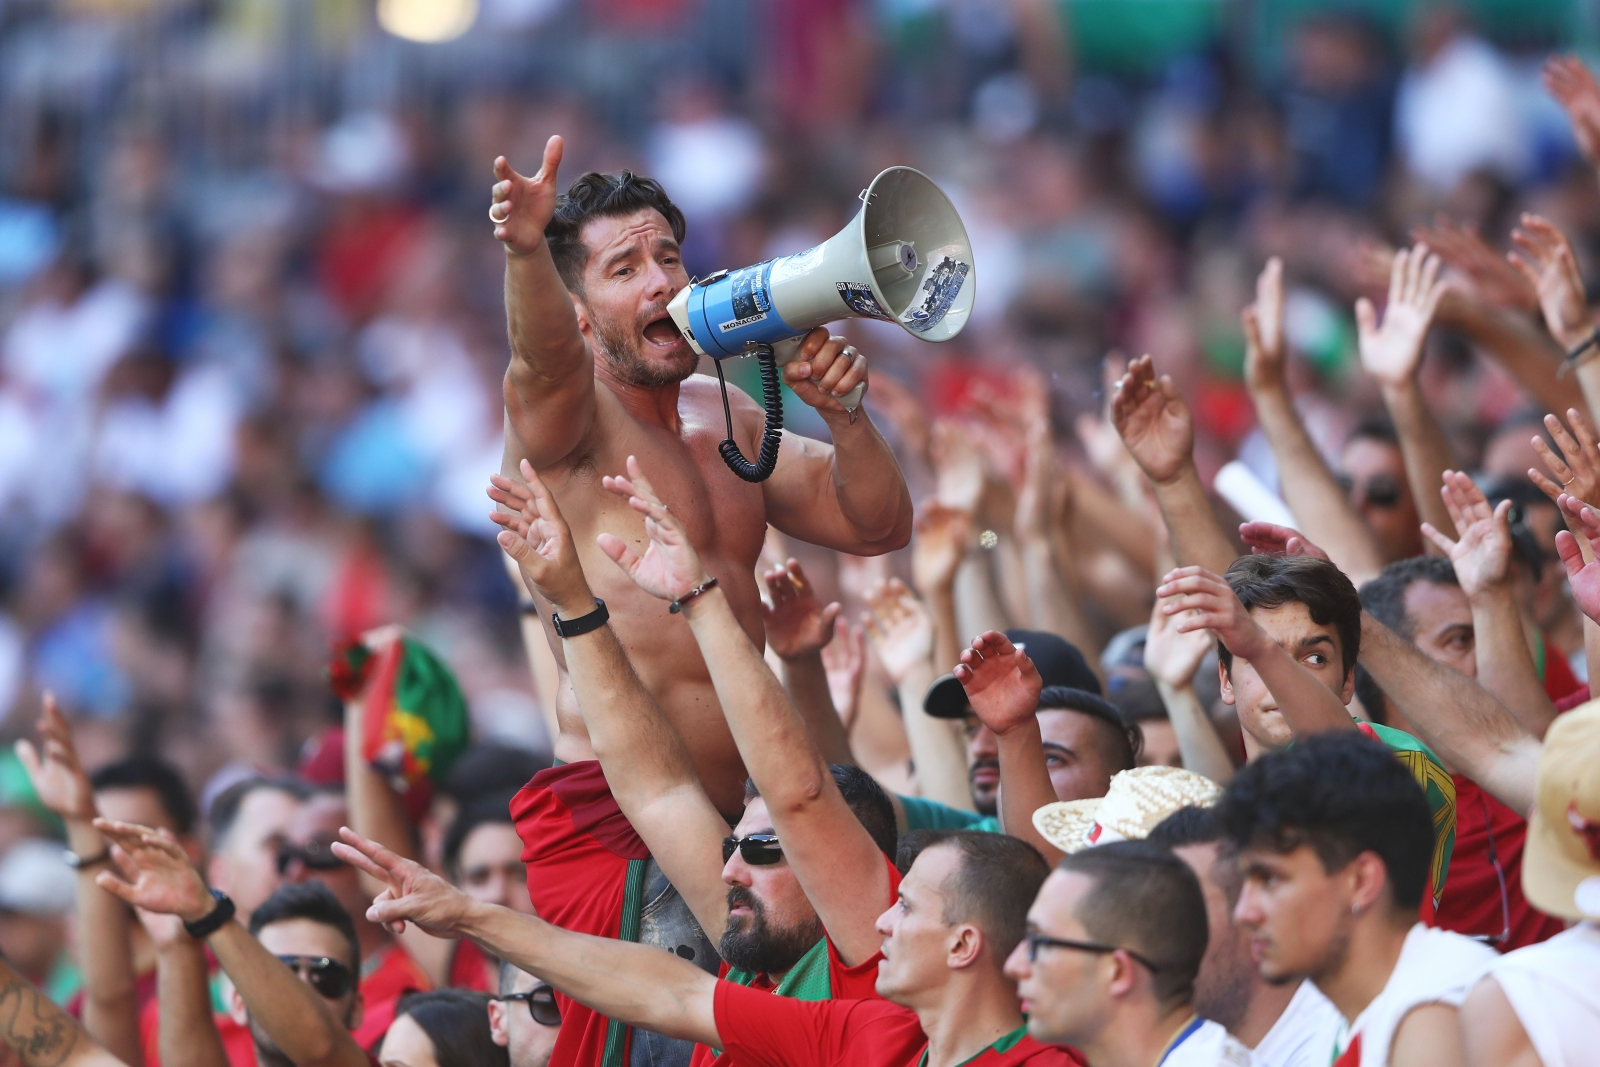 Portugal fans celebrate